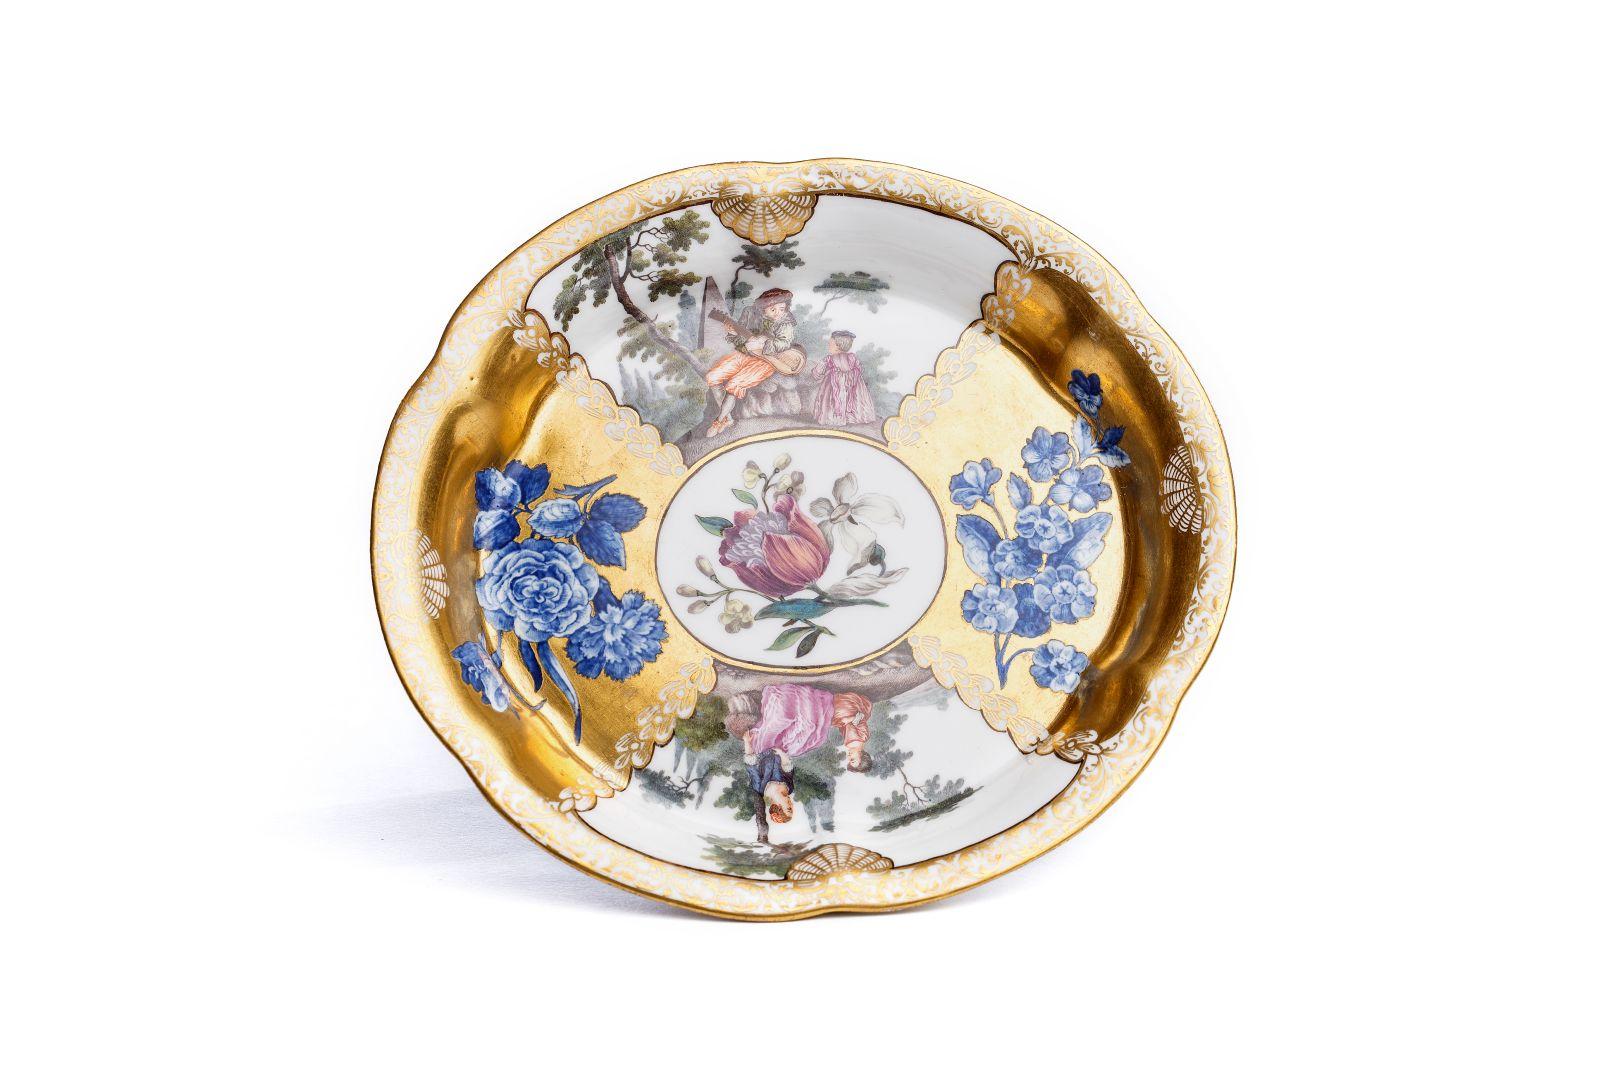 #26 Ornamental bowl, Meissen 1740 | Zierschale, Meissen 1740 Image